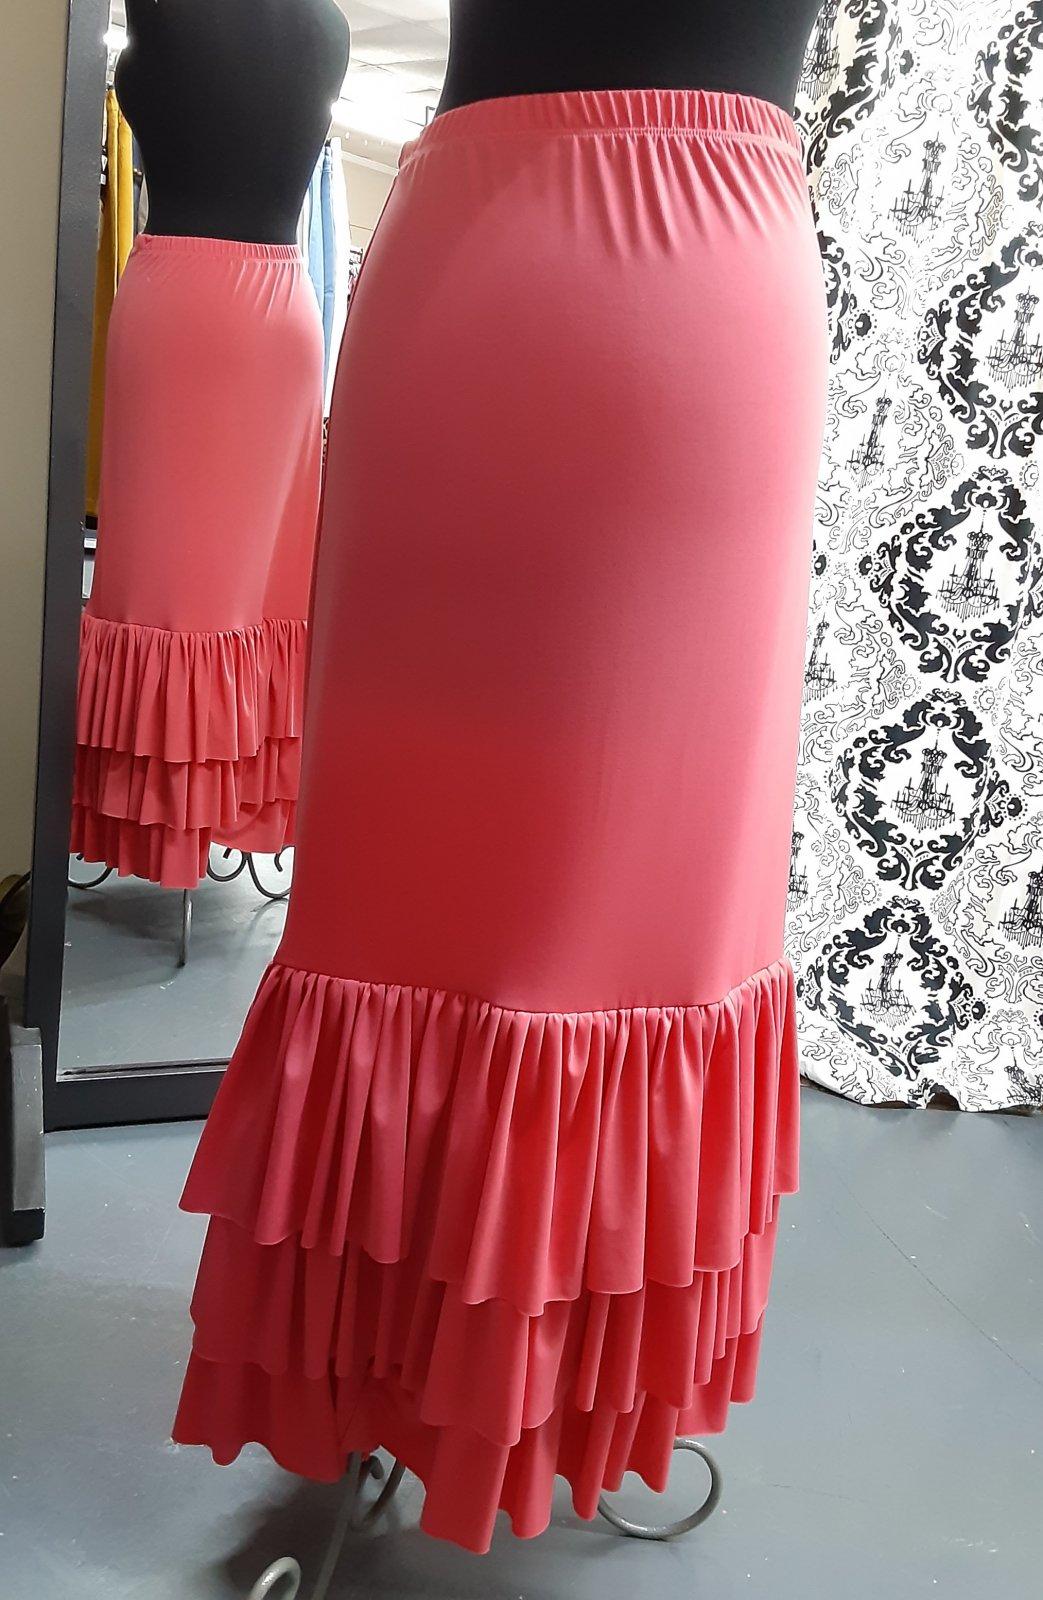 Plus 3 Ruffle Maxi Skirt Coral